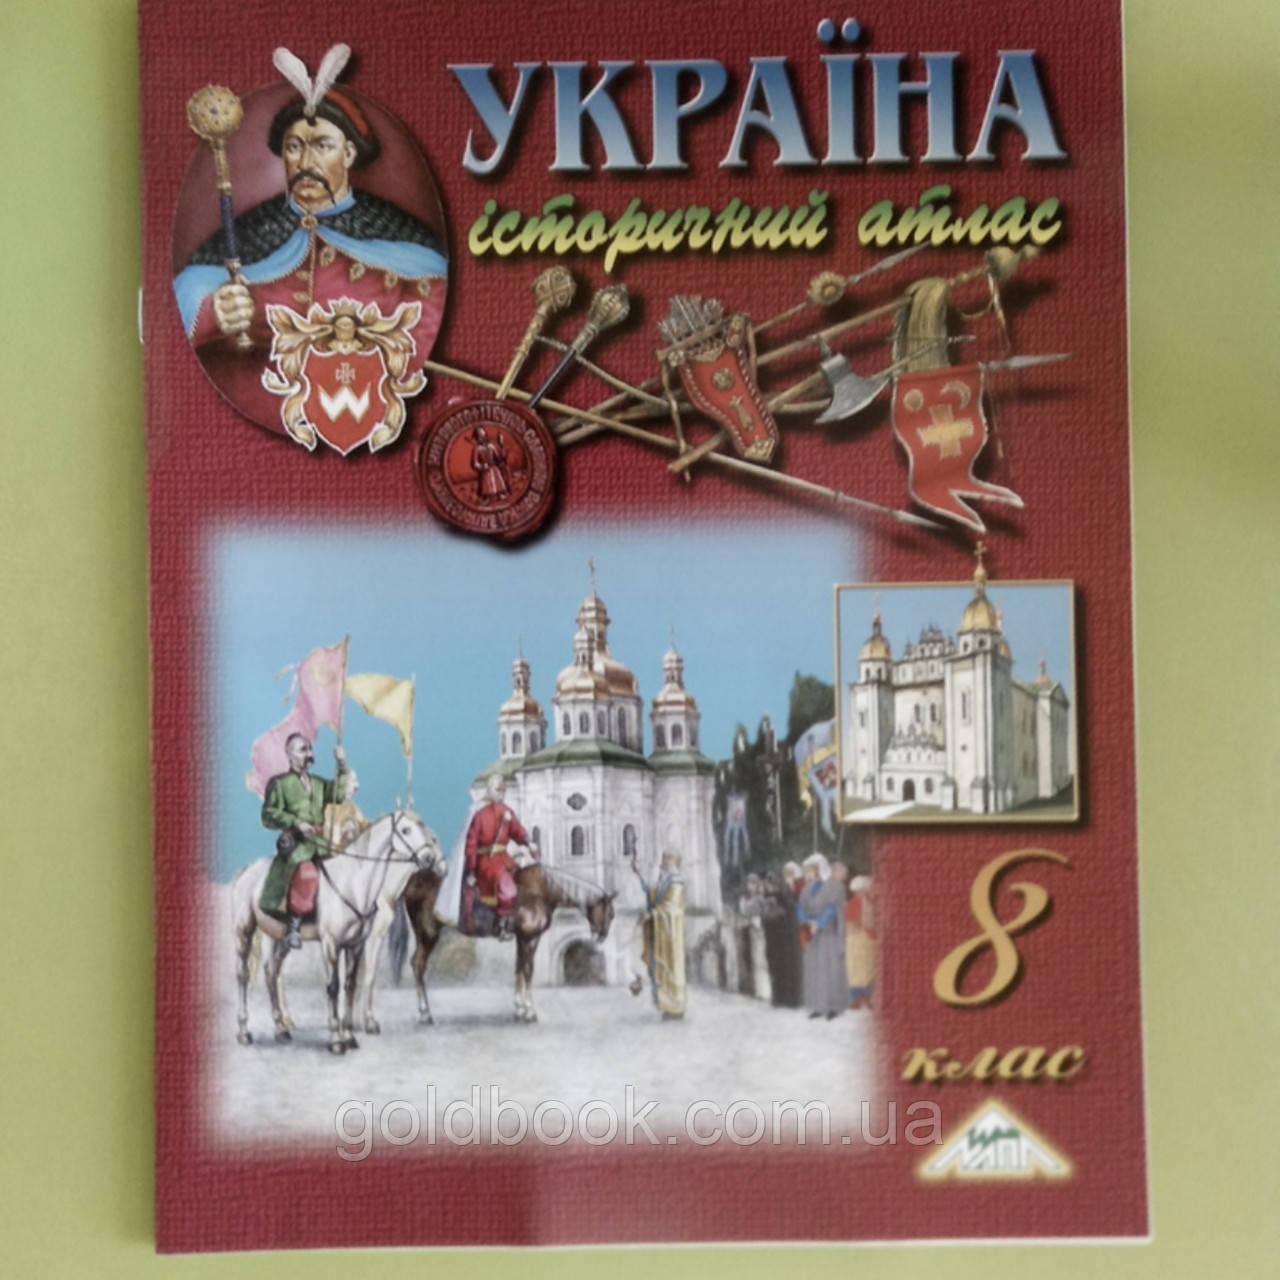 Україна історичний атлас 8 клас МАПА